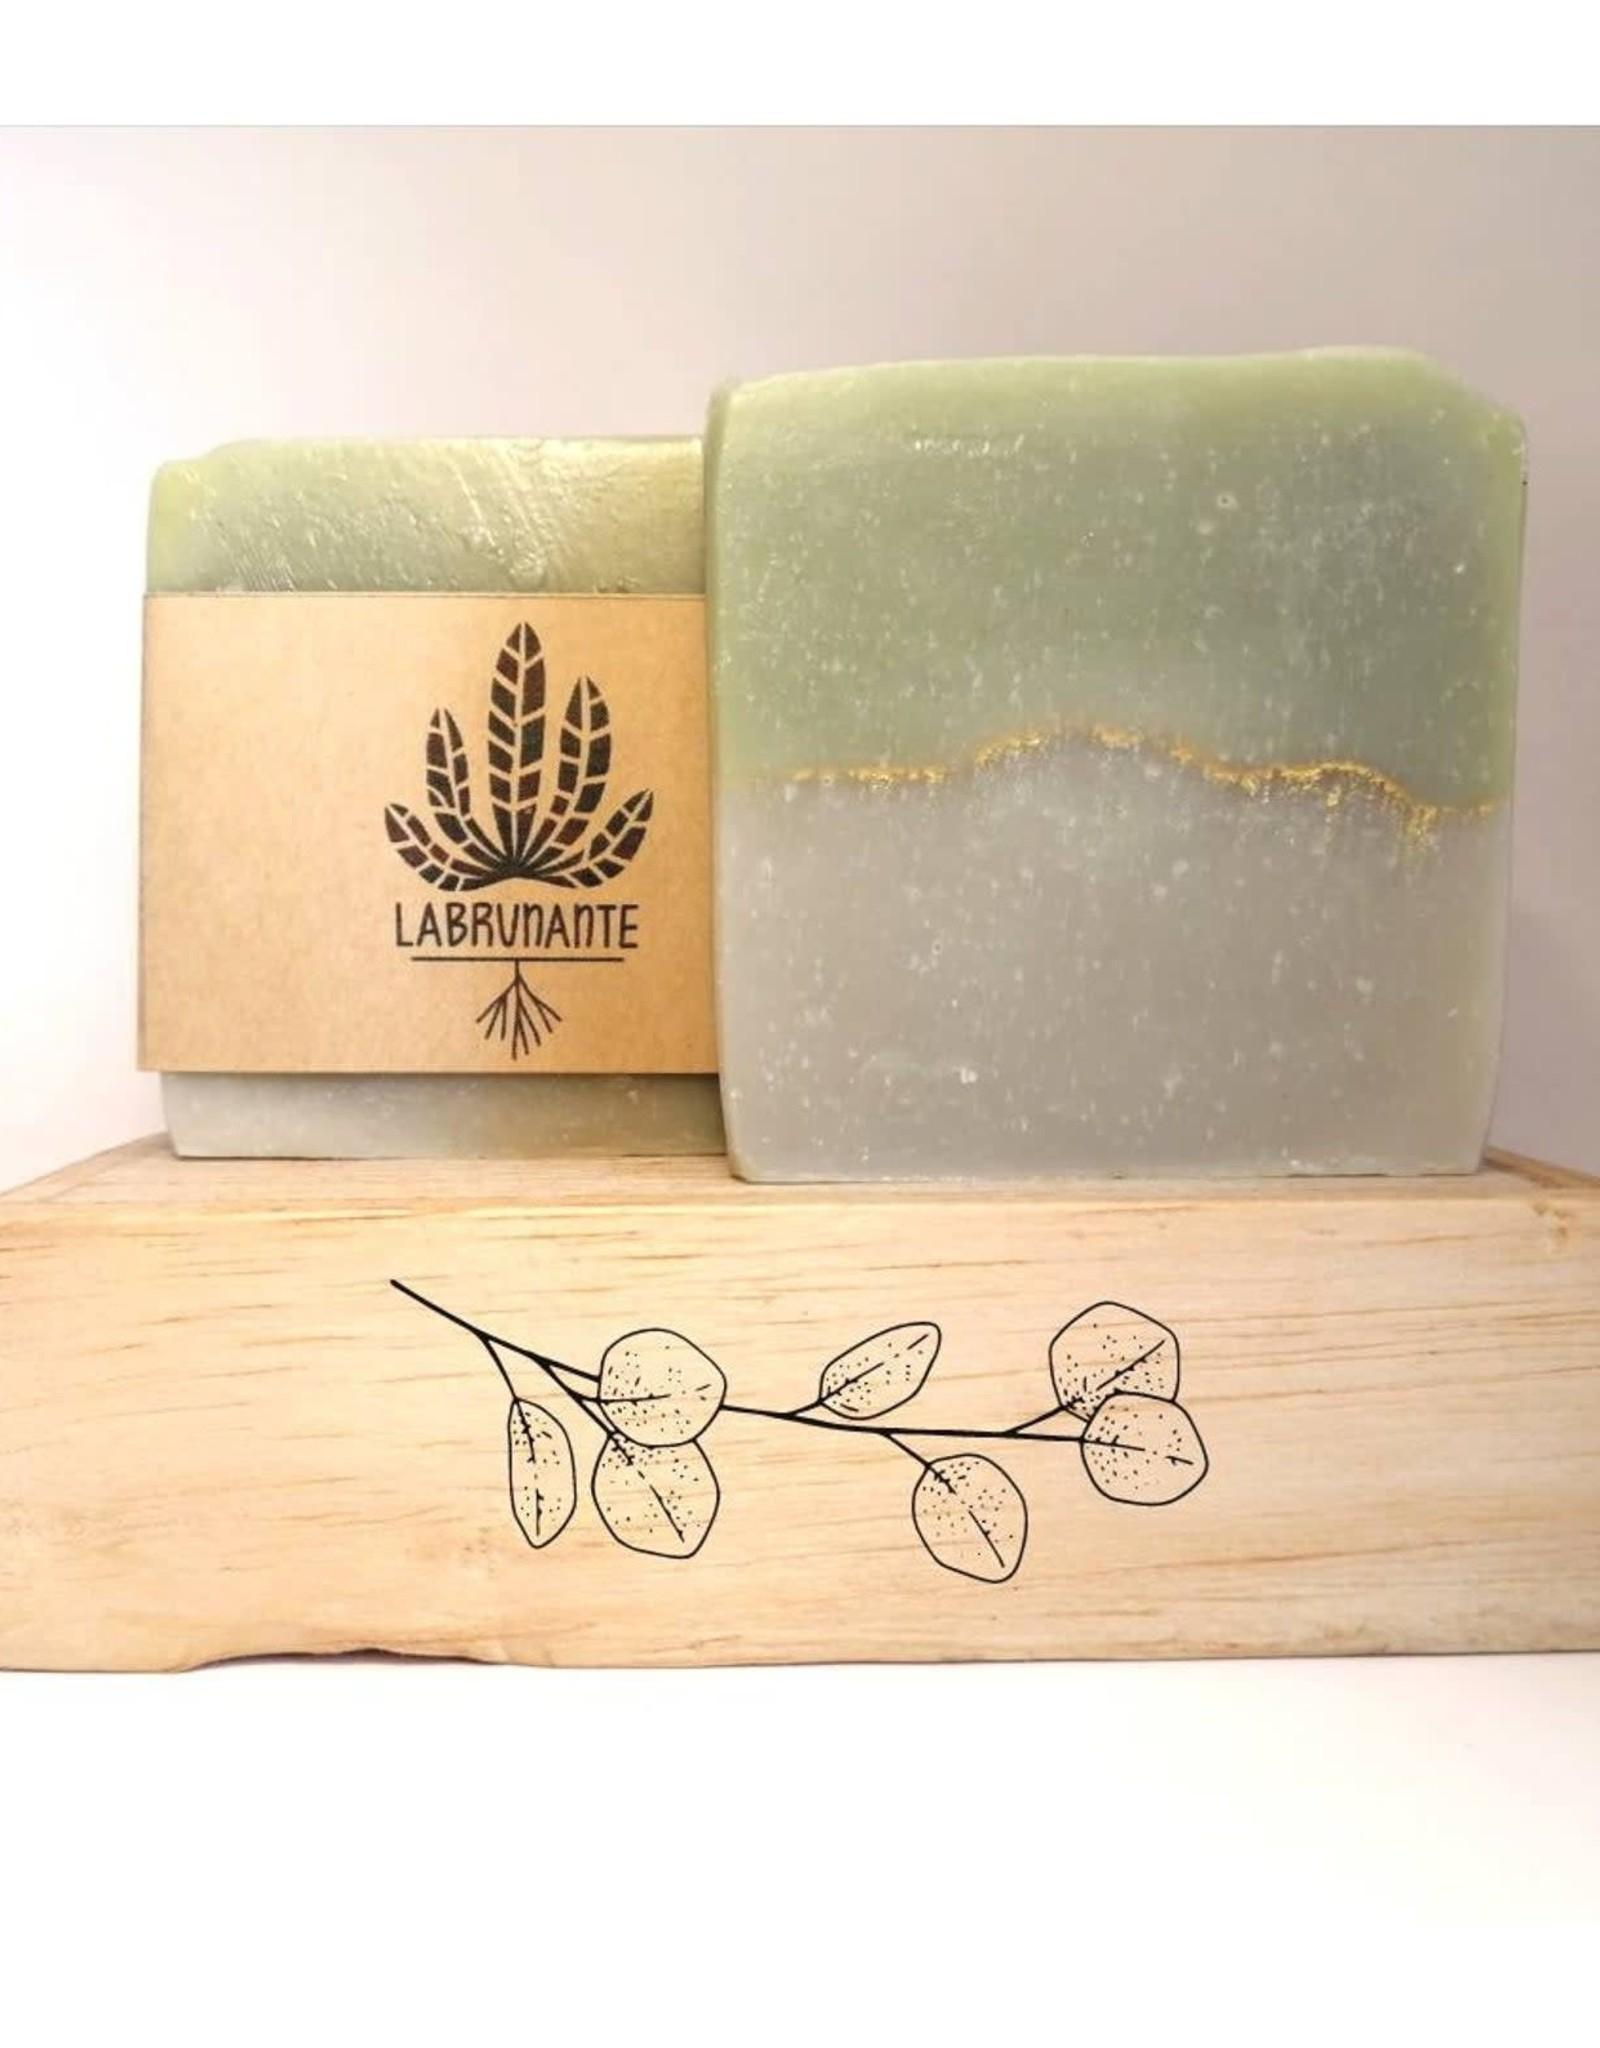 La Brunante Savon - Eucalyptus et argile verte